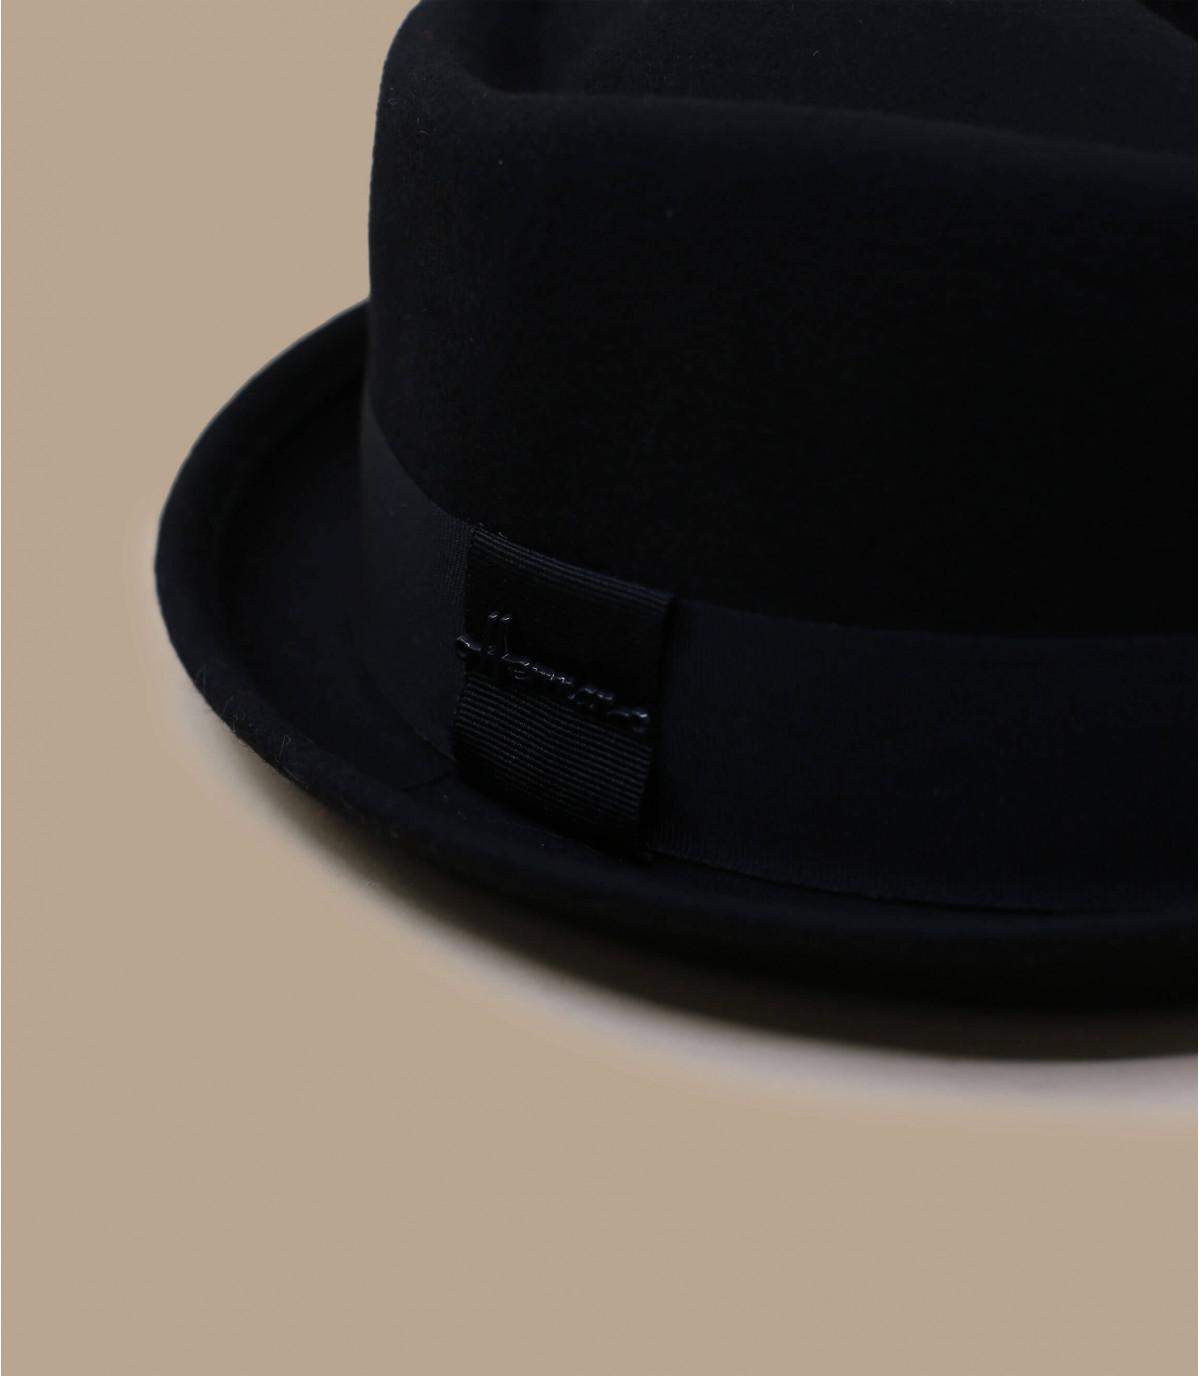 Dettagli Don Cash black - image 2